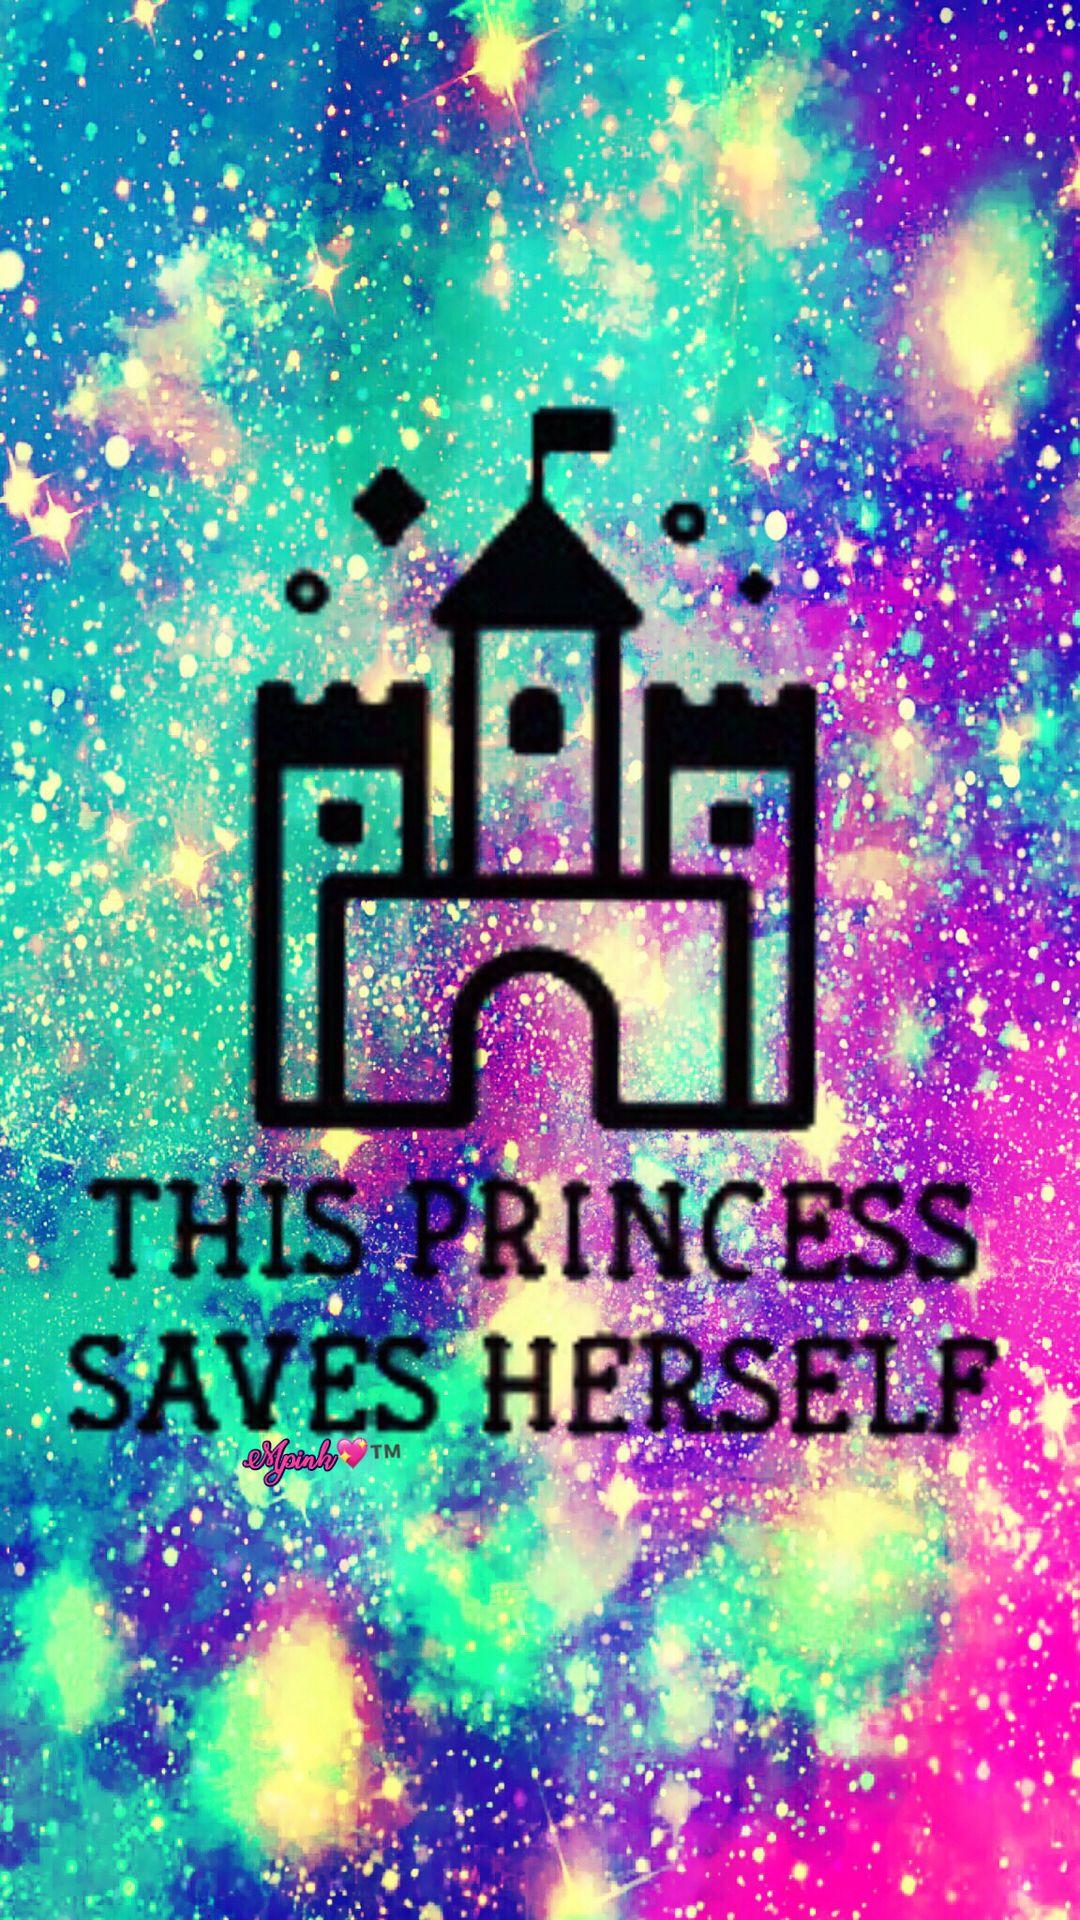 Infinity galaxy wallpaper hippies pinterest wallpaper this princess saves herself galaxy wallpaper androidwallpaper iphonewallpaper wallpaper galaxy sparkle voltagebd Gallery